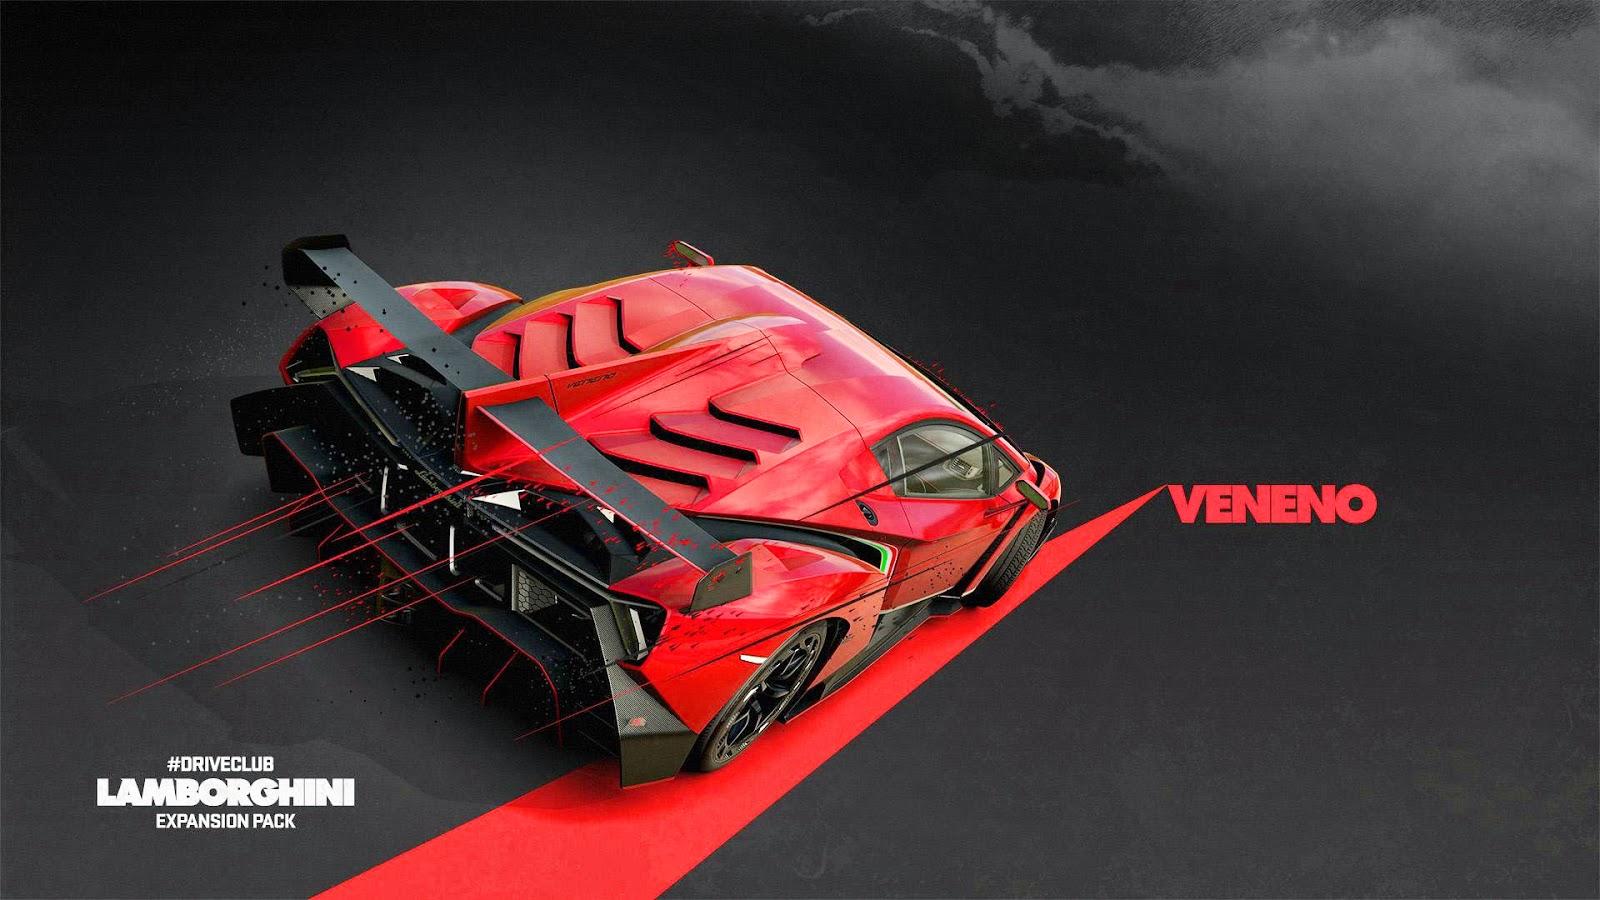 Papel de Parede Carro Lamborghini Veneno para pc hd grátis Sports car desktop hd wallpaper image free